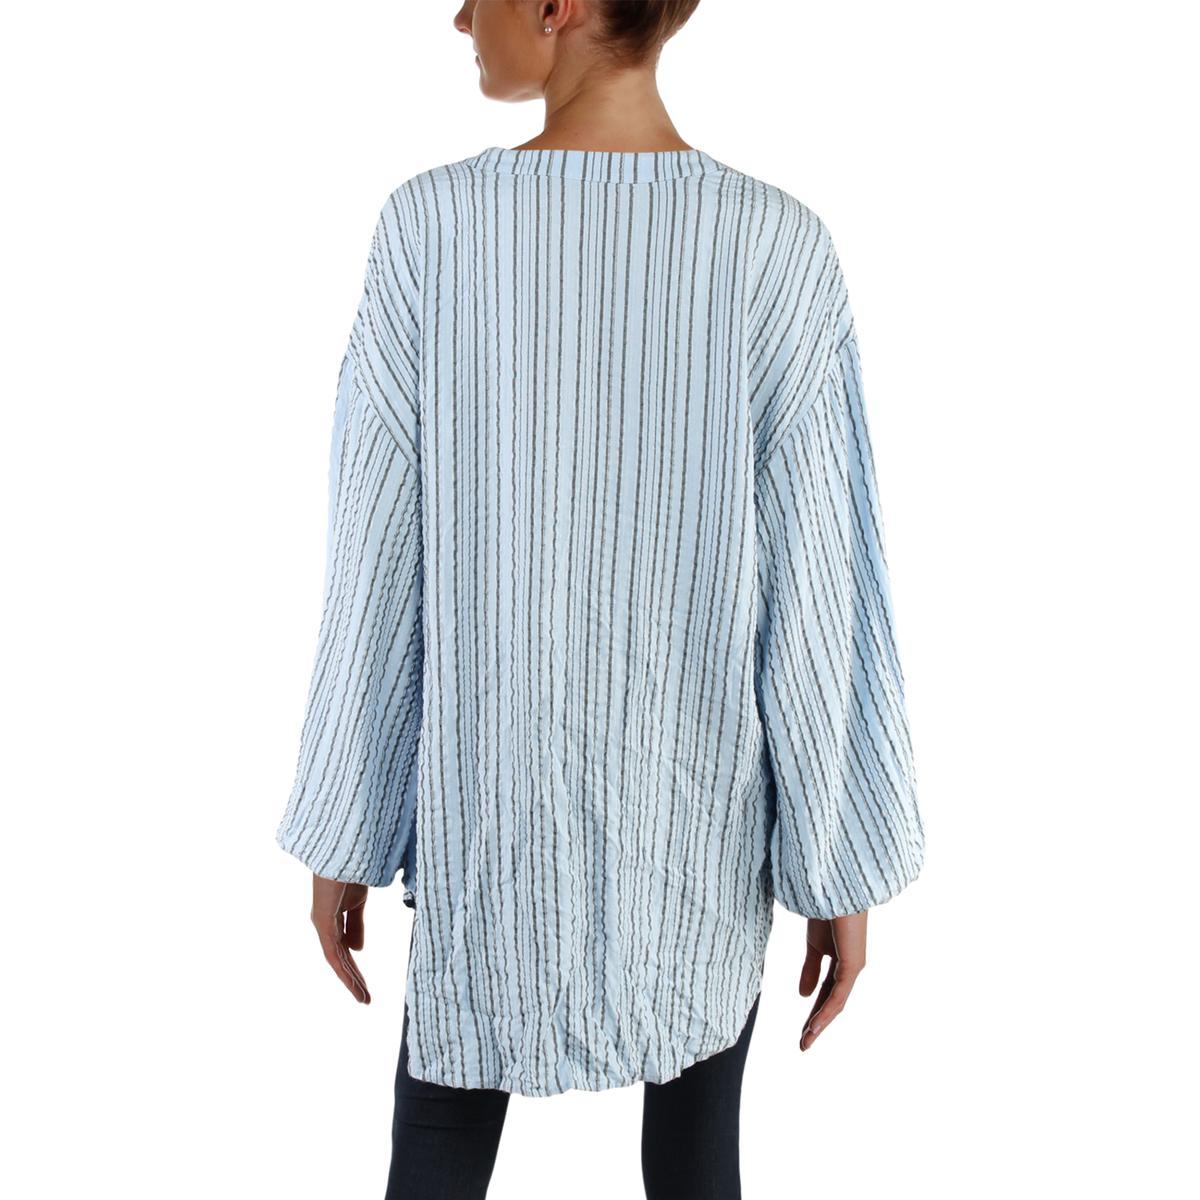 Bishop Bhfo Top Casual 7197 Tunic Shirt Striped Sleeves Womens Free People xwEgAZxP